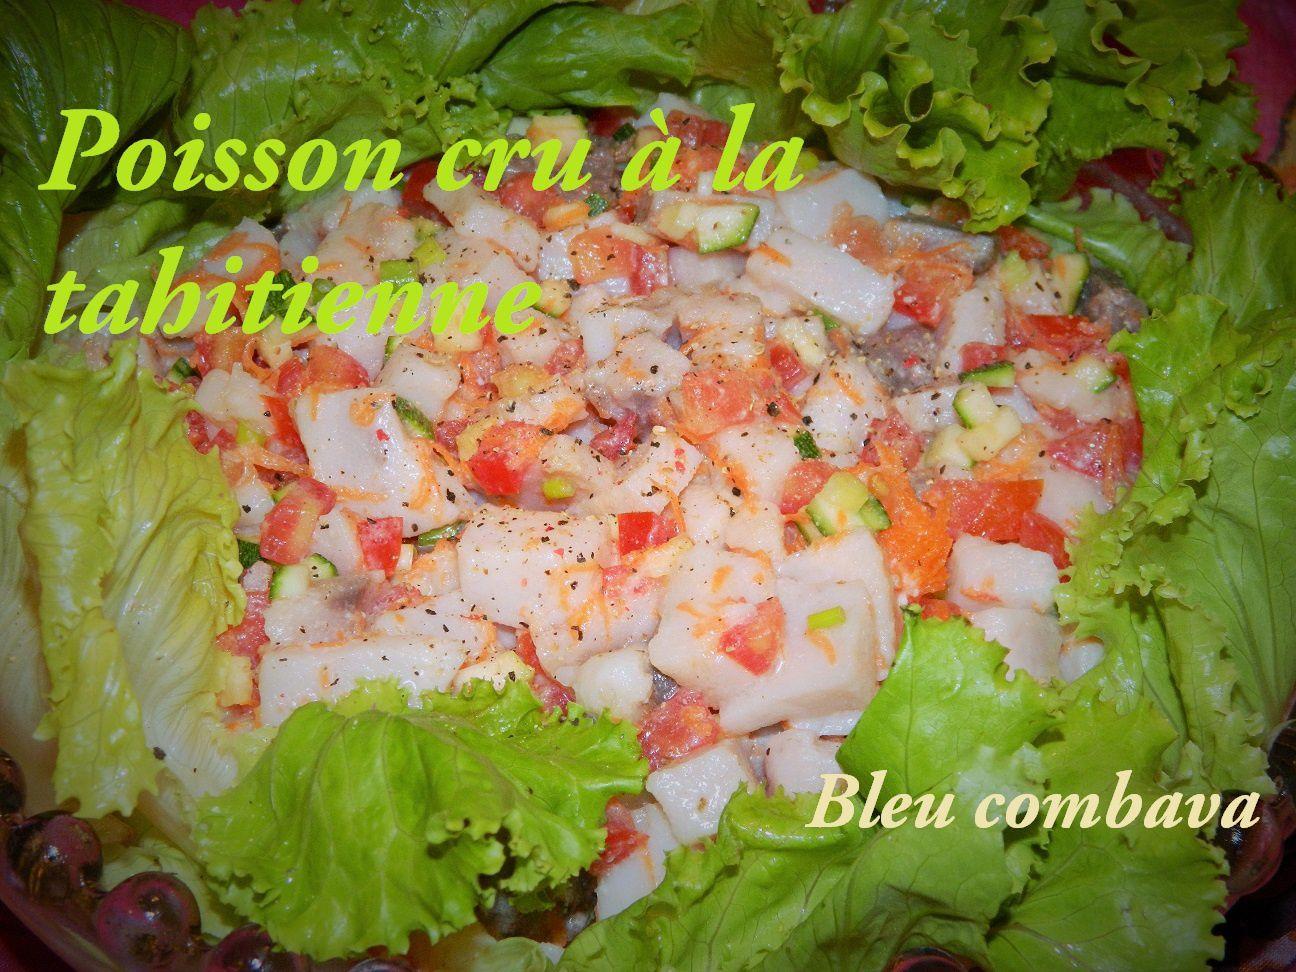 espadon façon poisson cru à la tahitienne - ma cuisine bleu combava